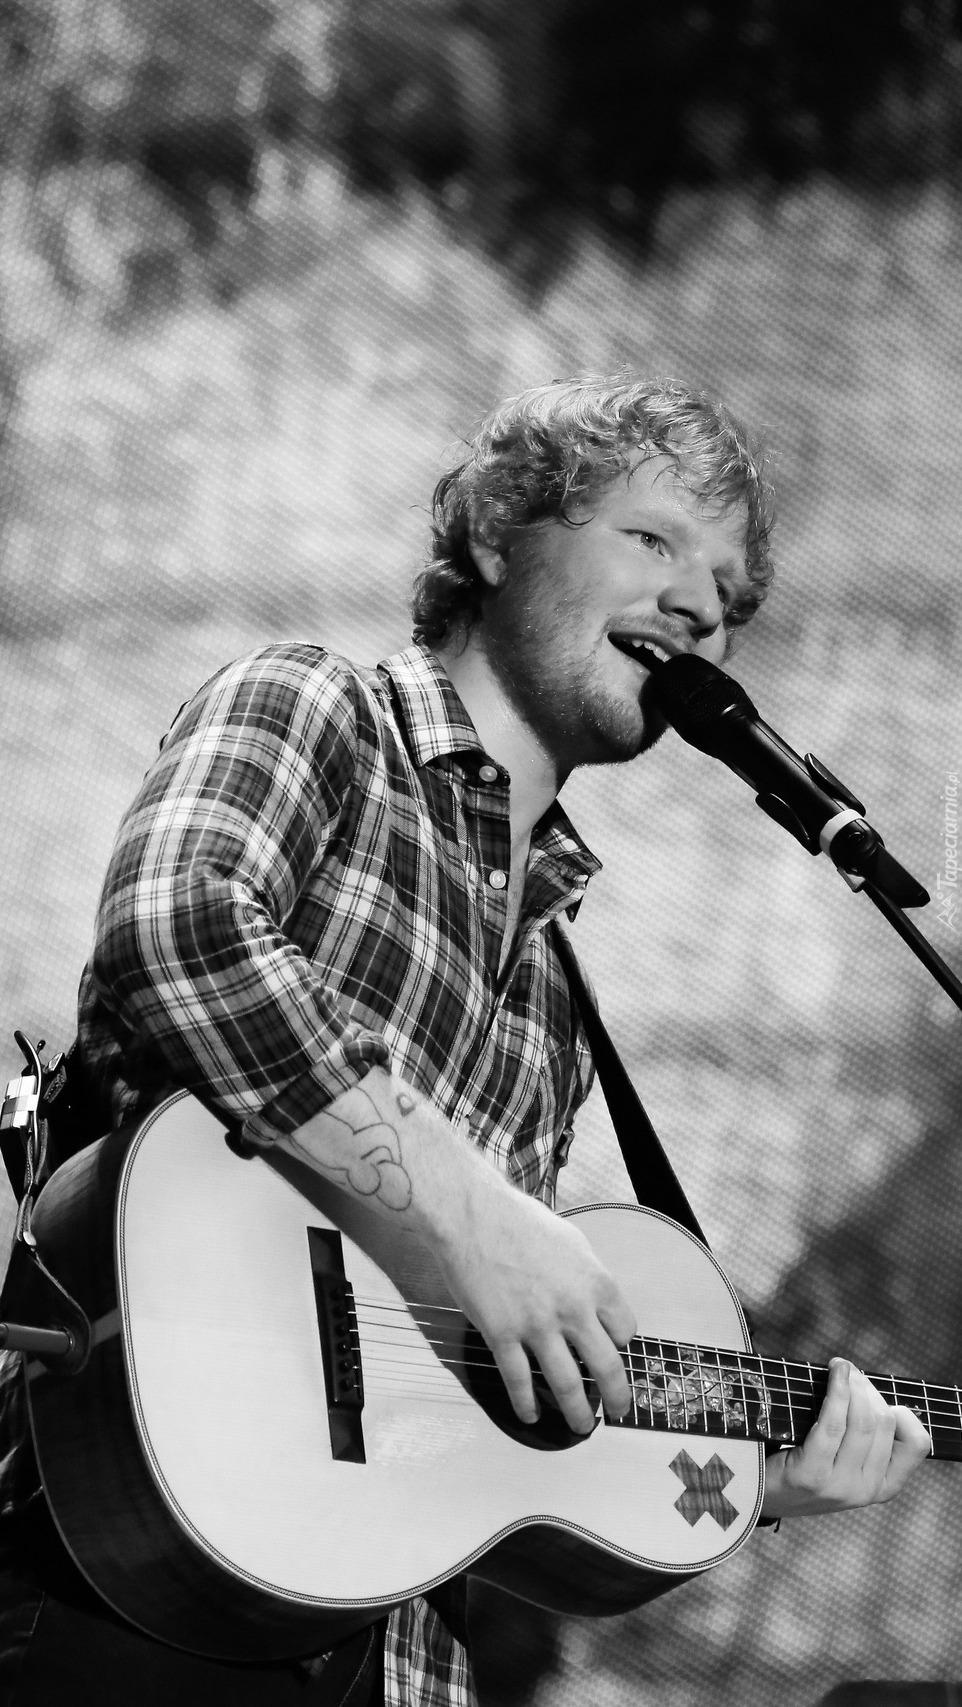 Ed Sheeran z gitarą